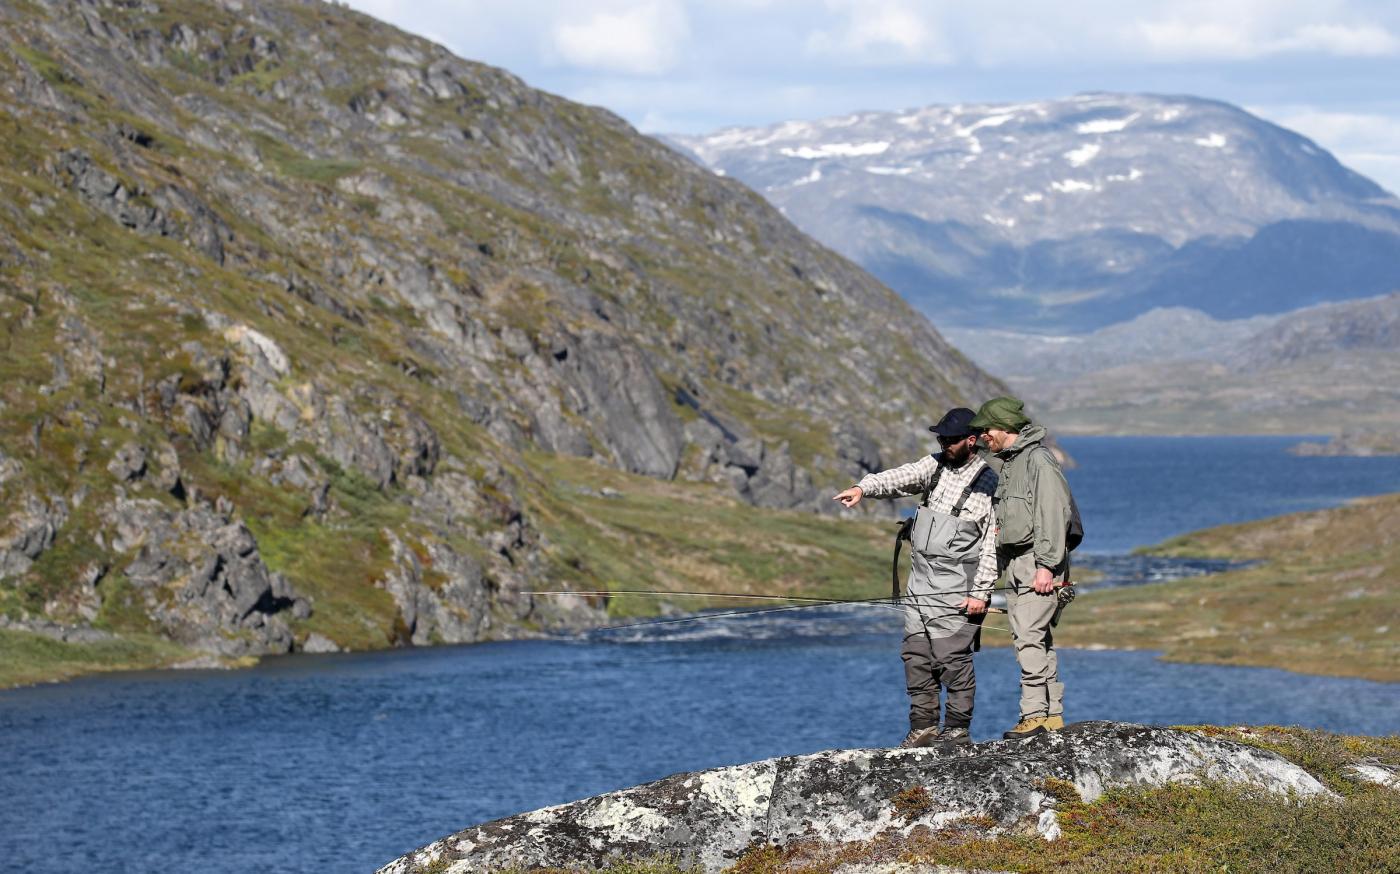 Two Fishermen near Amitsuarsuk. Photo - Crispin Rodwell, Visit Greenland